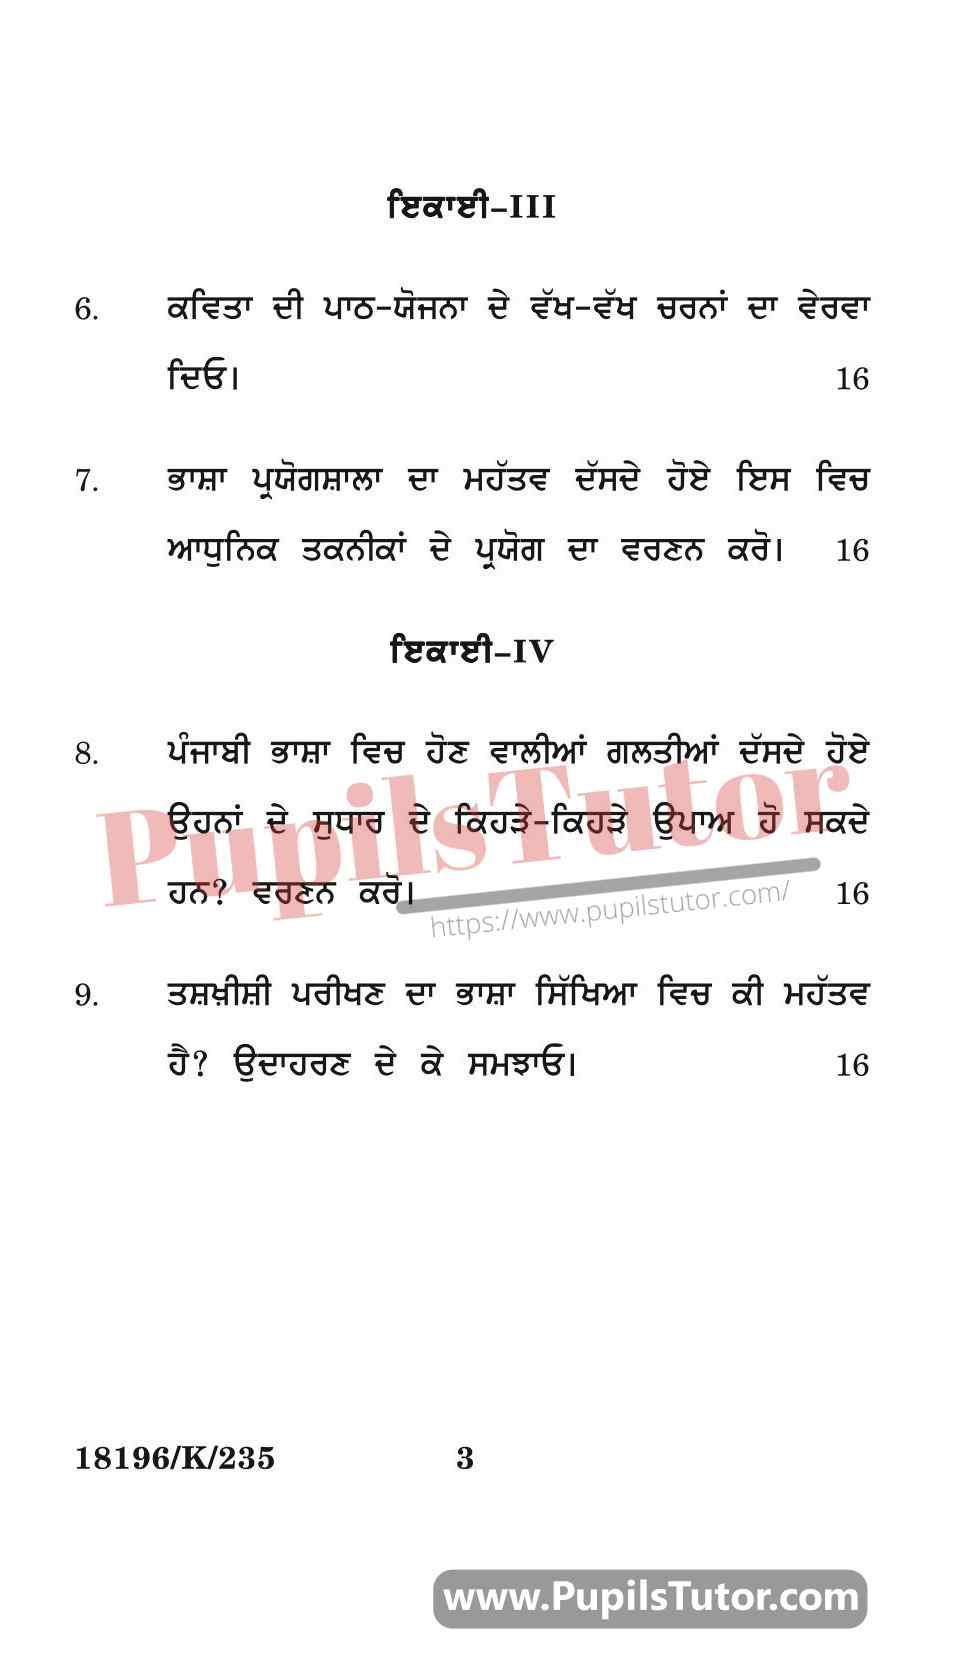 KUK (Kurukshetra University, Haryana) Pedagogy Of Punjabi Question Paper 2020 For B.Ed 1st And 2nd Year And All The 4 Semesters Free Download PDF